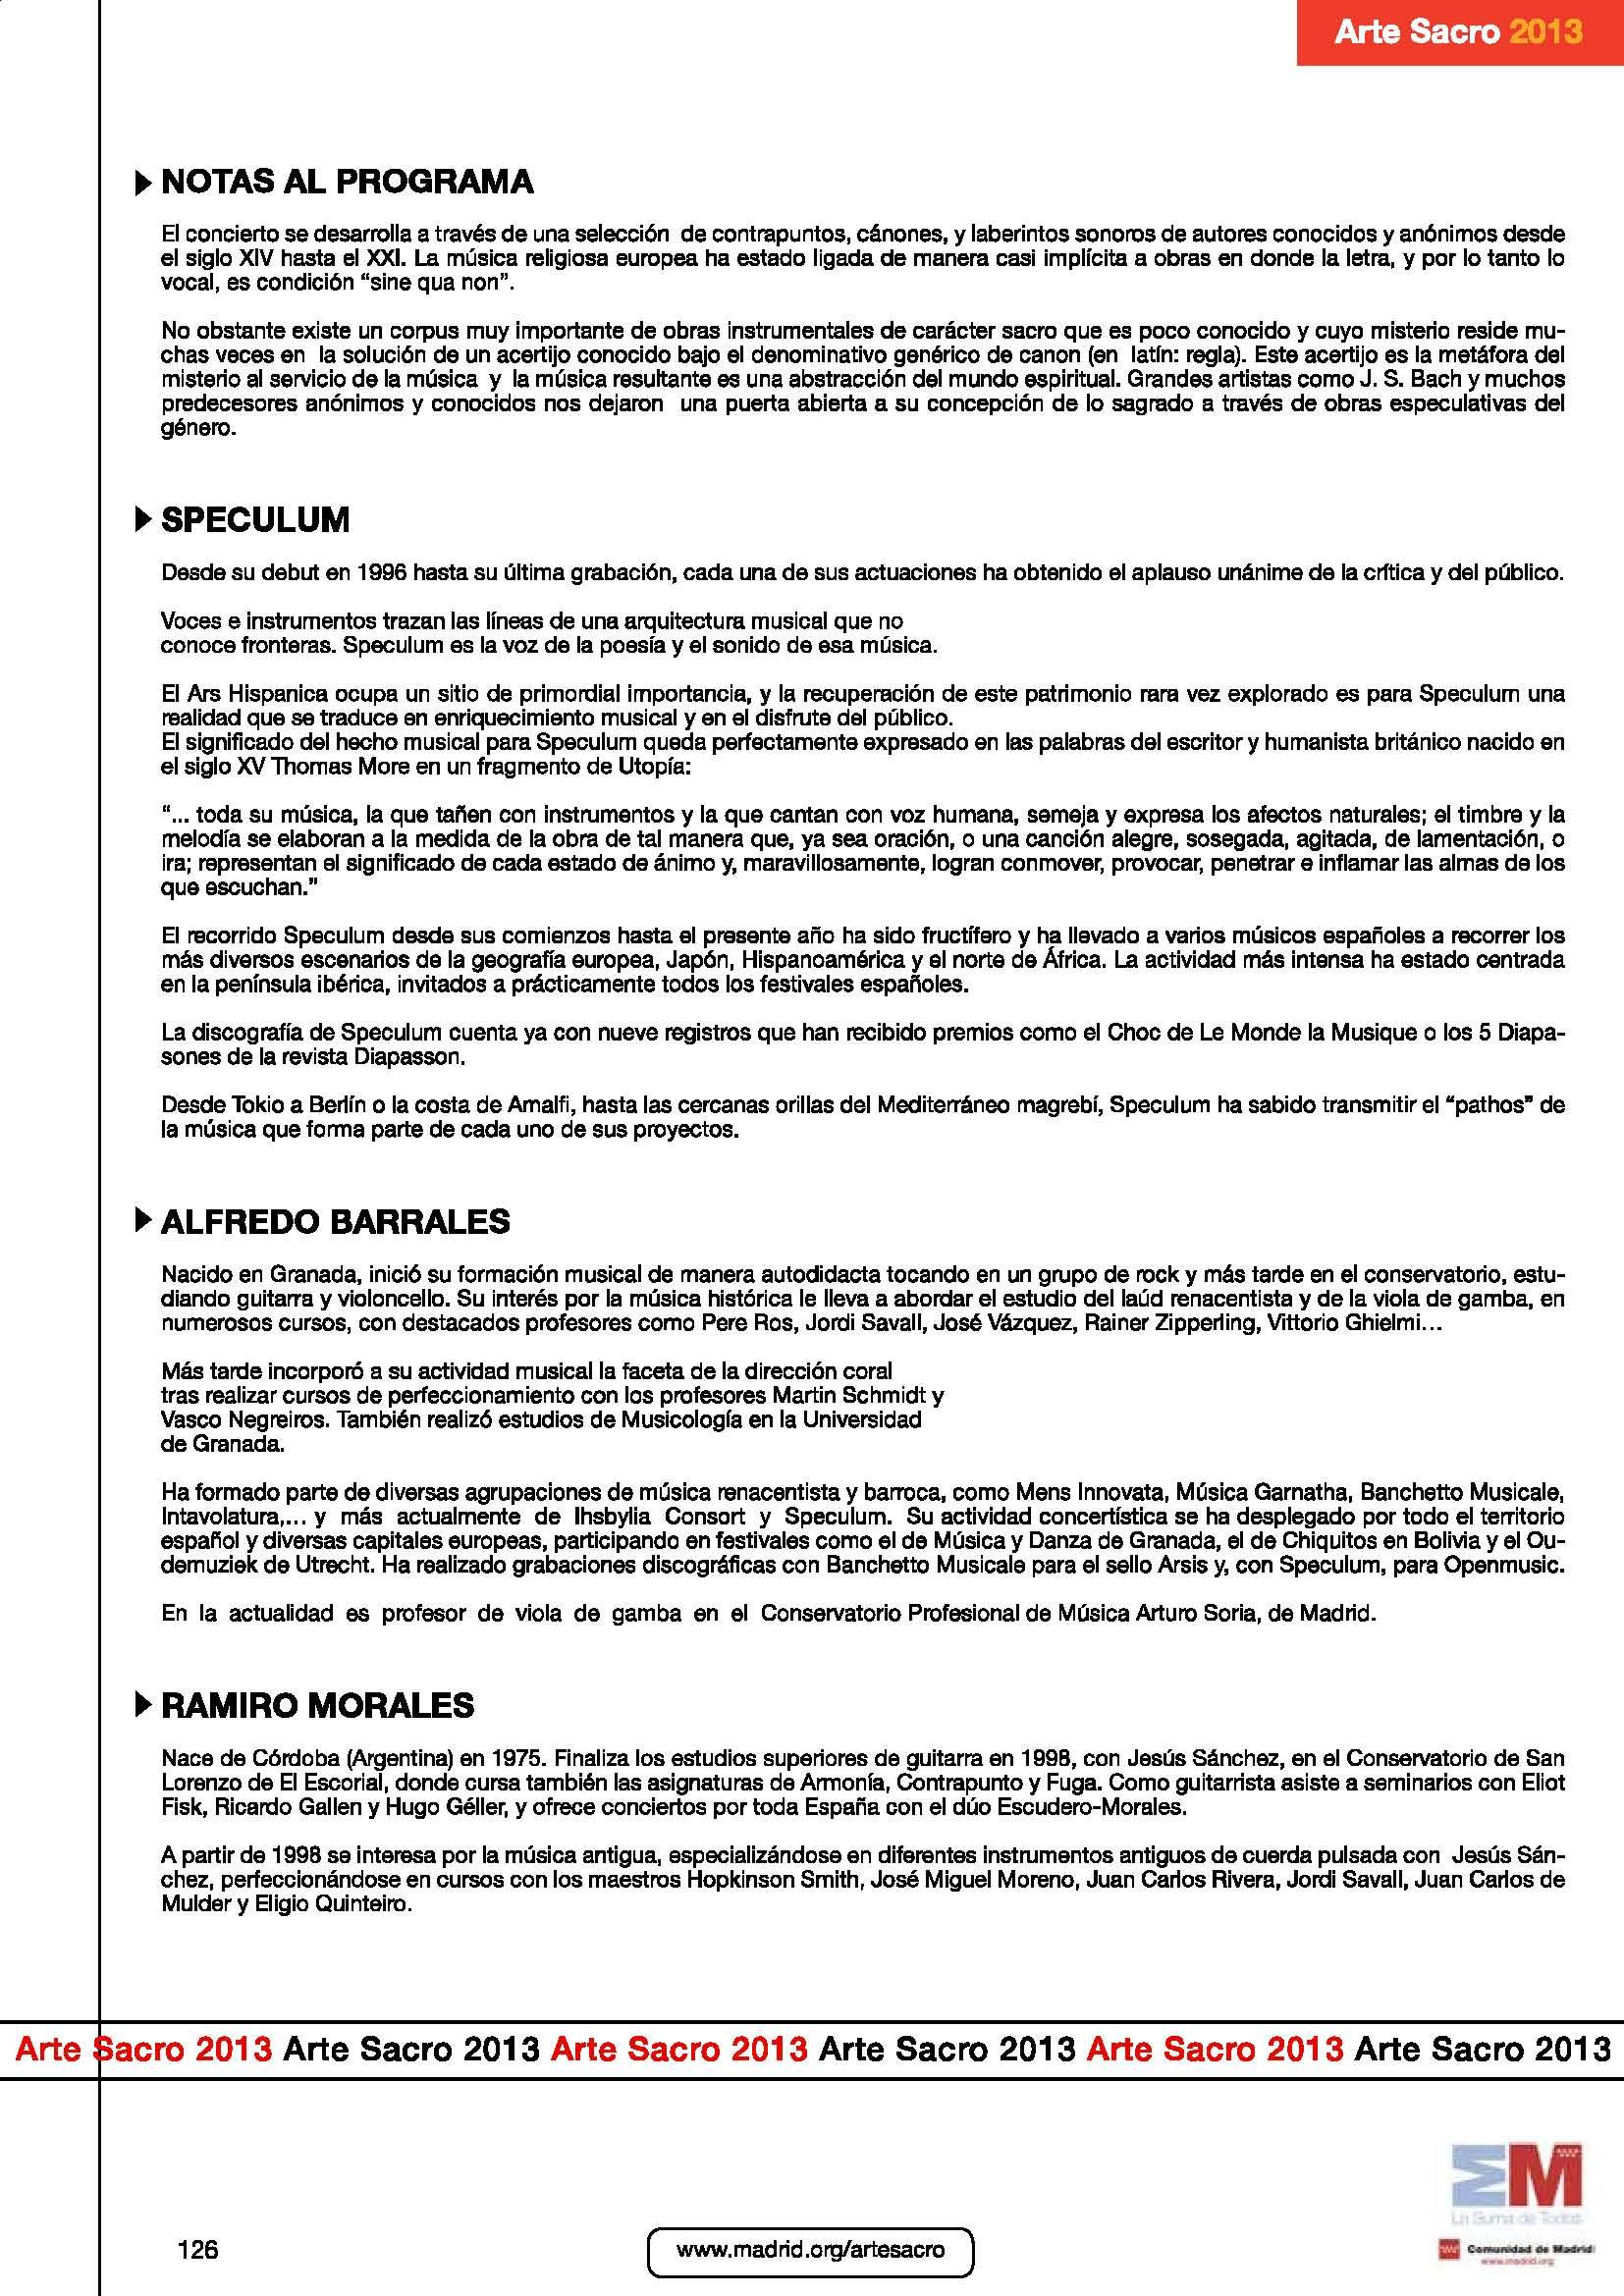 dossier_completo_Página_126